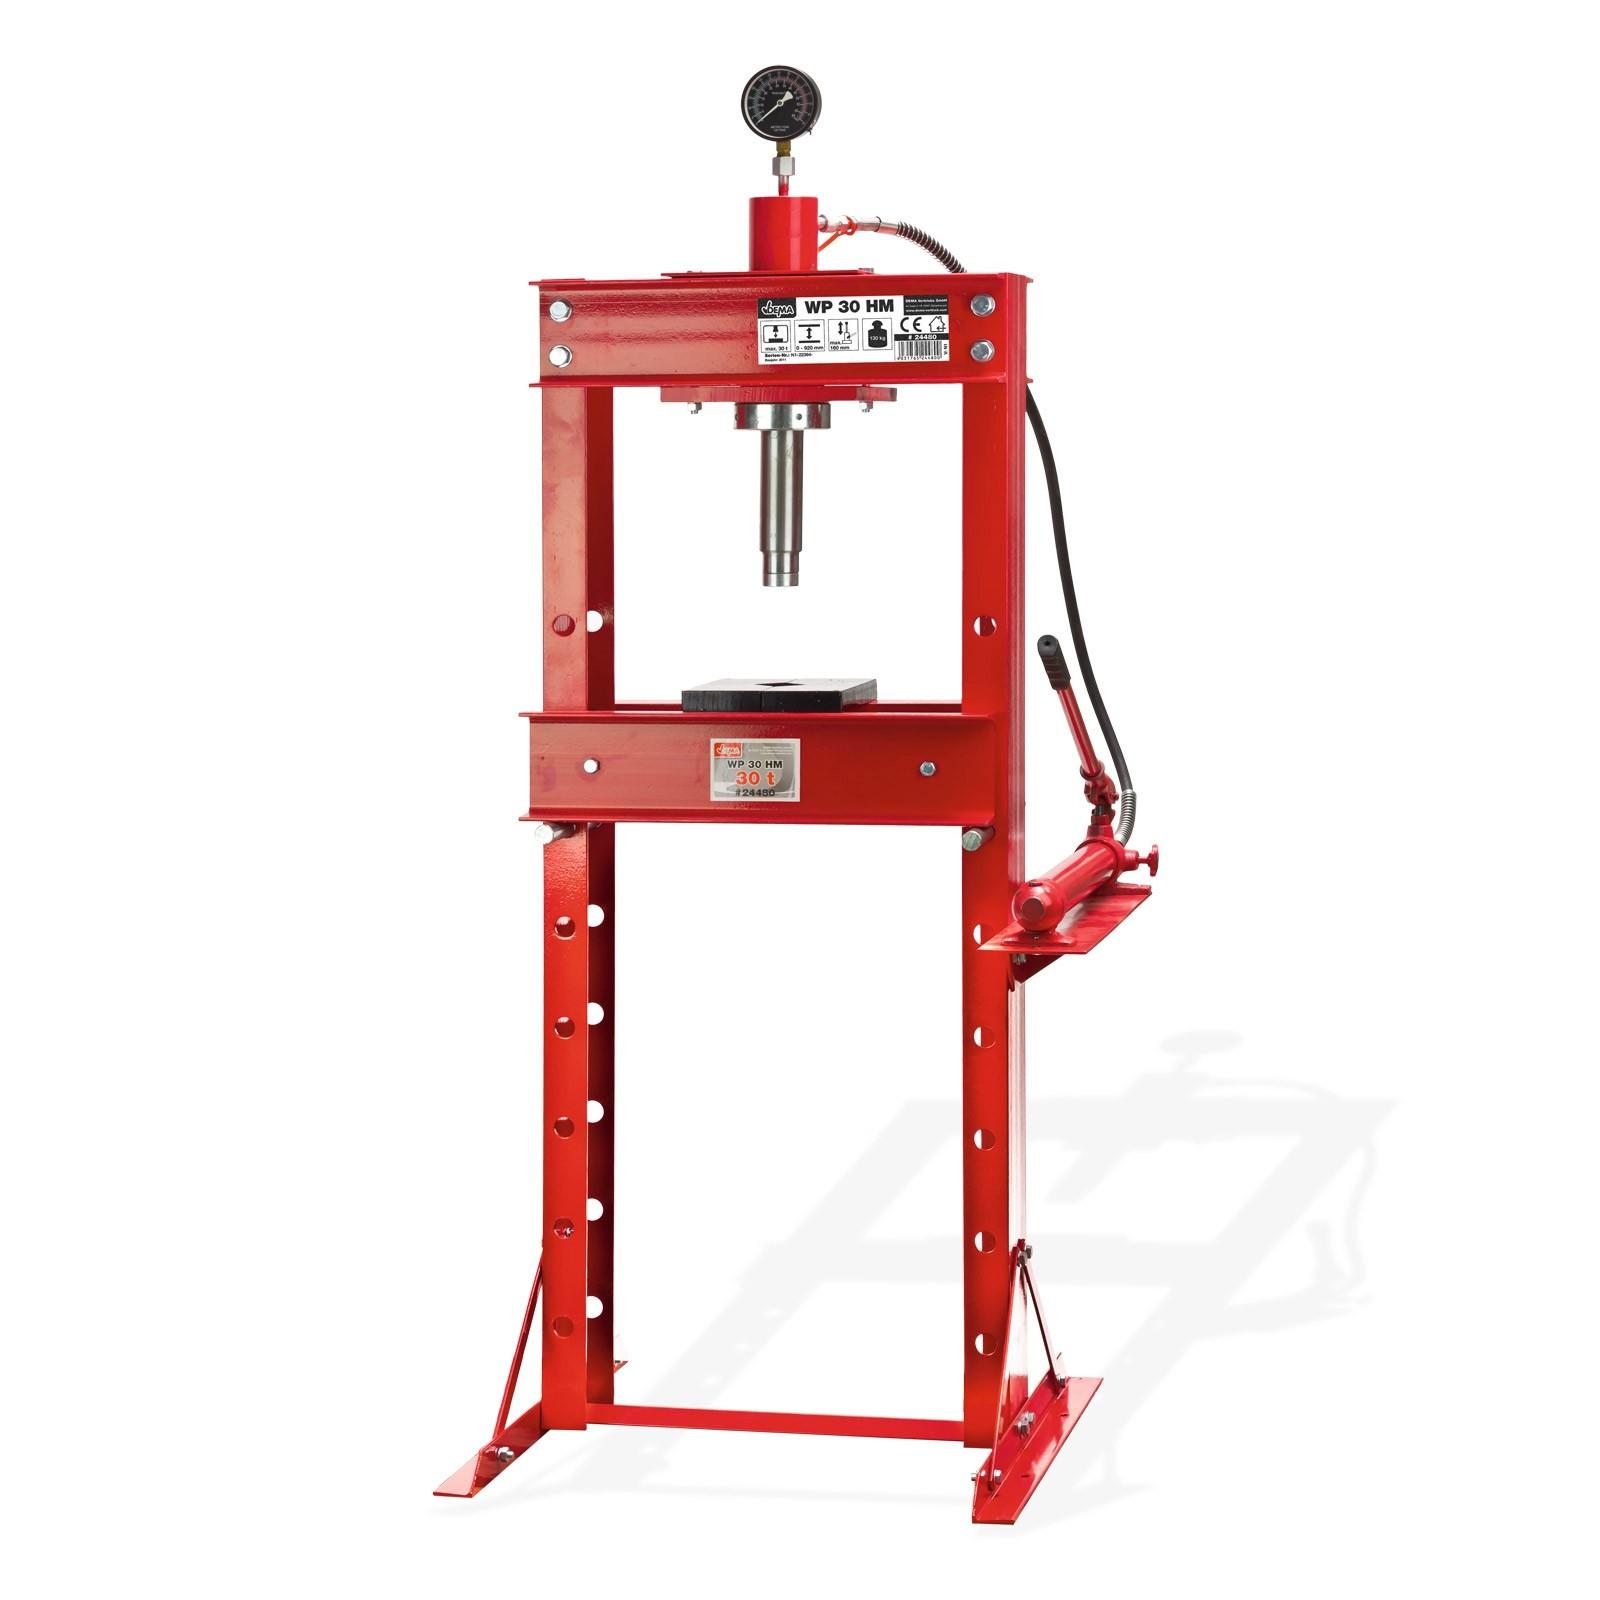 Dema Werkstattpresse 30t Hydraulikpresse Lagerpresse Hydraulik Presse 24480